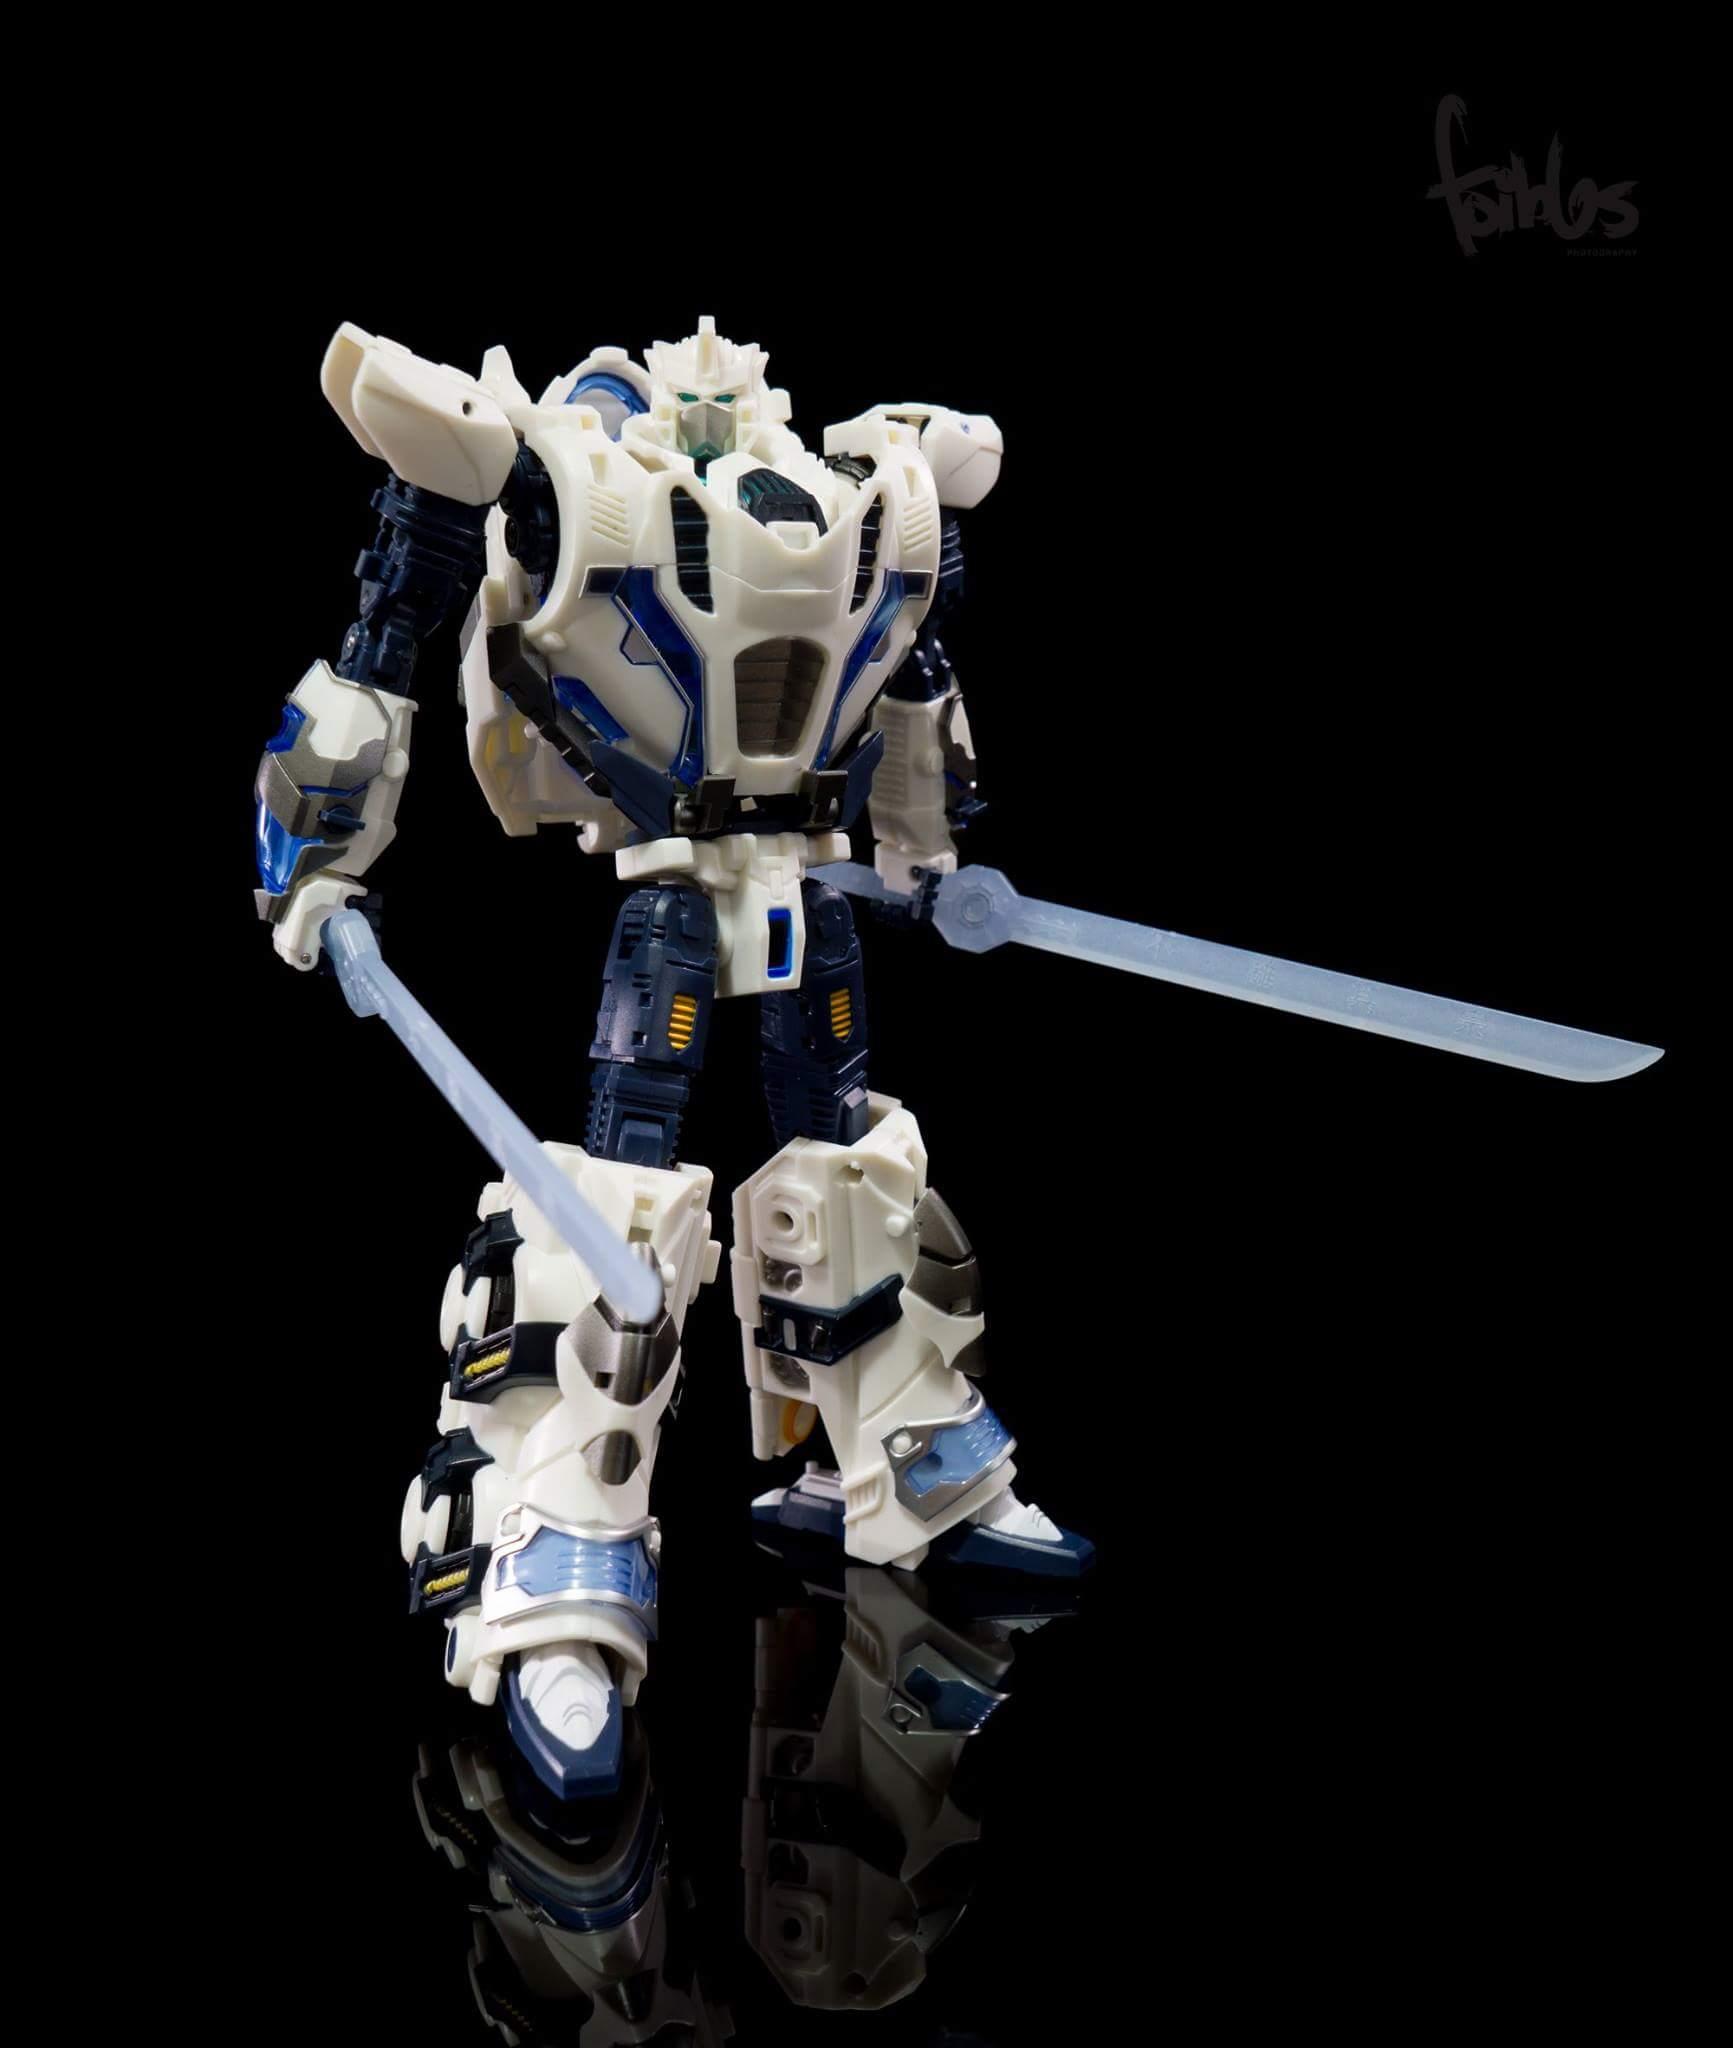 [Mastermind Creations] Produit Tiers - Reformatted R-11 Seraphicus Prominon - aka Nova Prime LgK6M97l